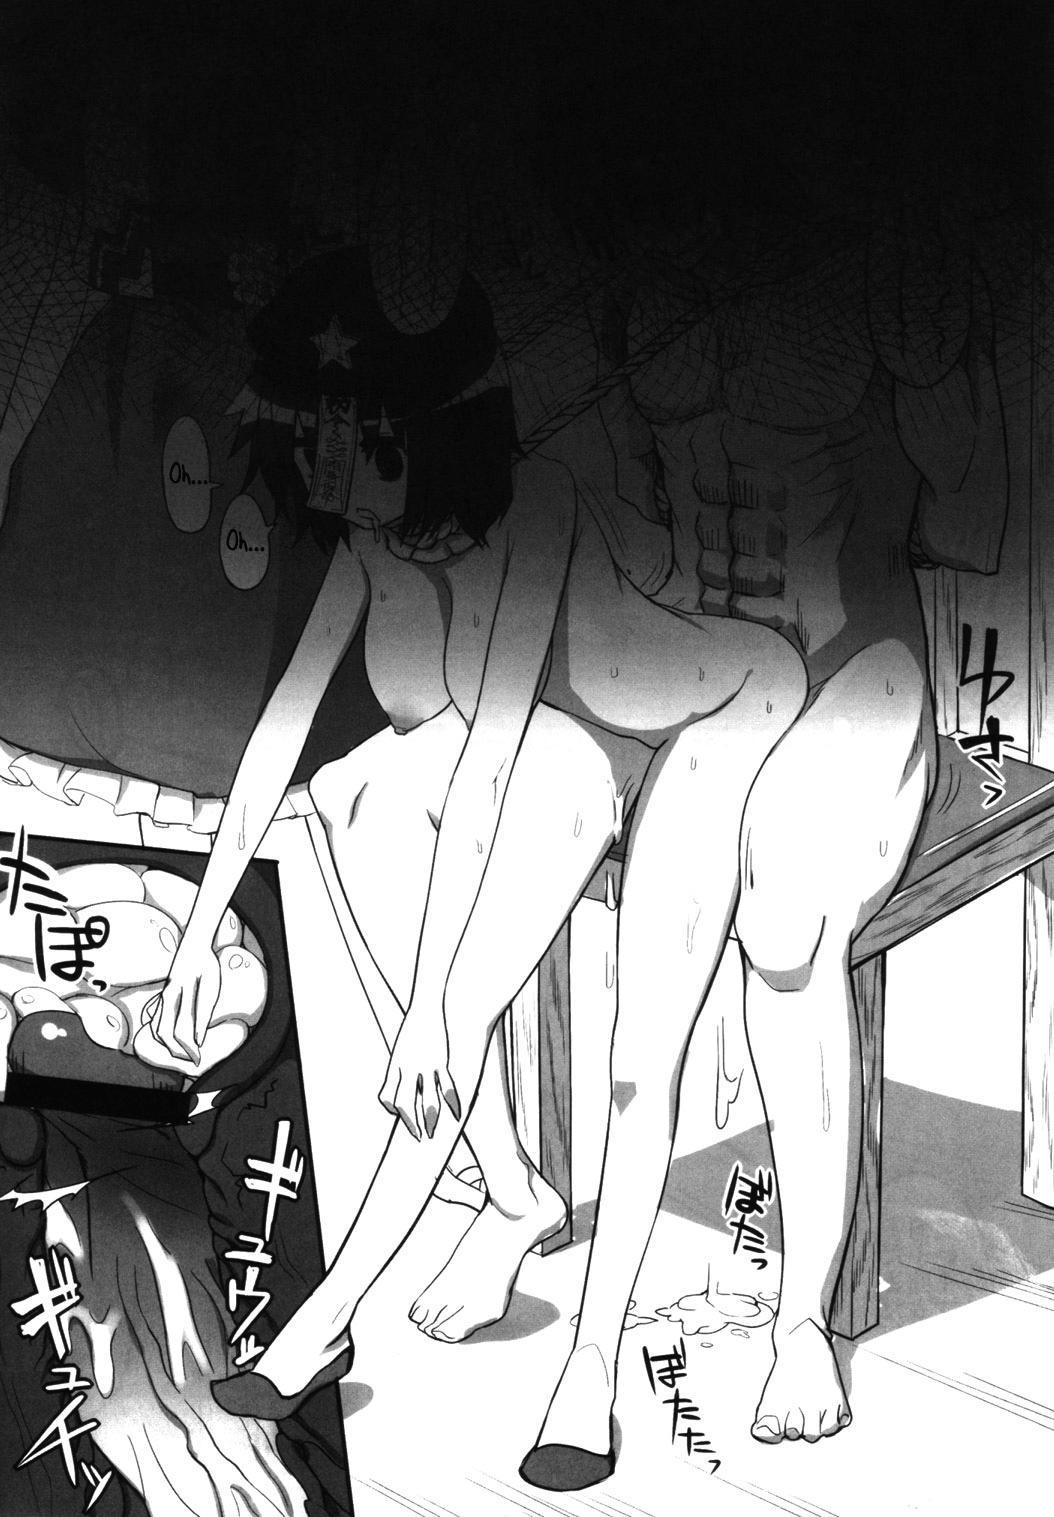 (Reitaisai 9) [various] Touhou Sleep Sex Anthology ch1-3, 6-8, 10, 14, 16, 19, 21 (Touhou Project) [English] {pesu} 93